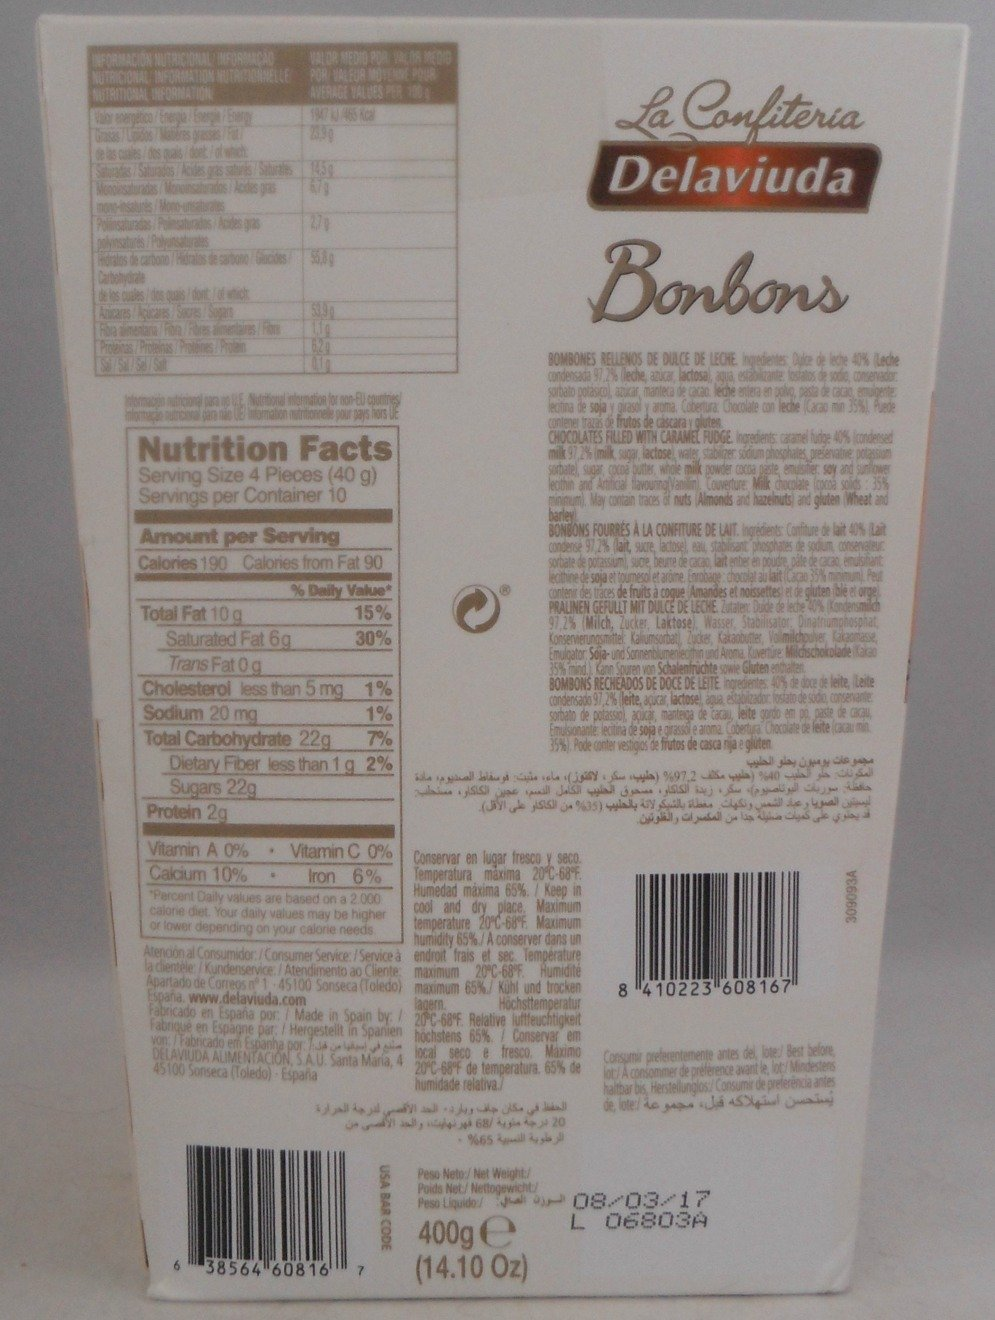 Amazon.com : Delaviuda Extra Large Box Of Caramel Cream Bonbons - 14.10Oz (400g) - Bonbons Dulce De Leche - Product Of Spain : Grocery & Gourmet Food